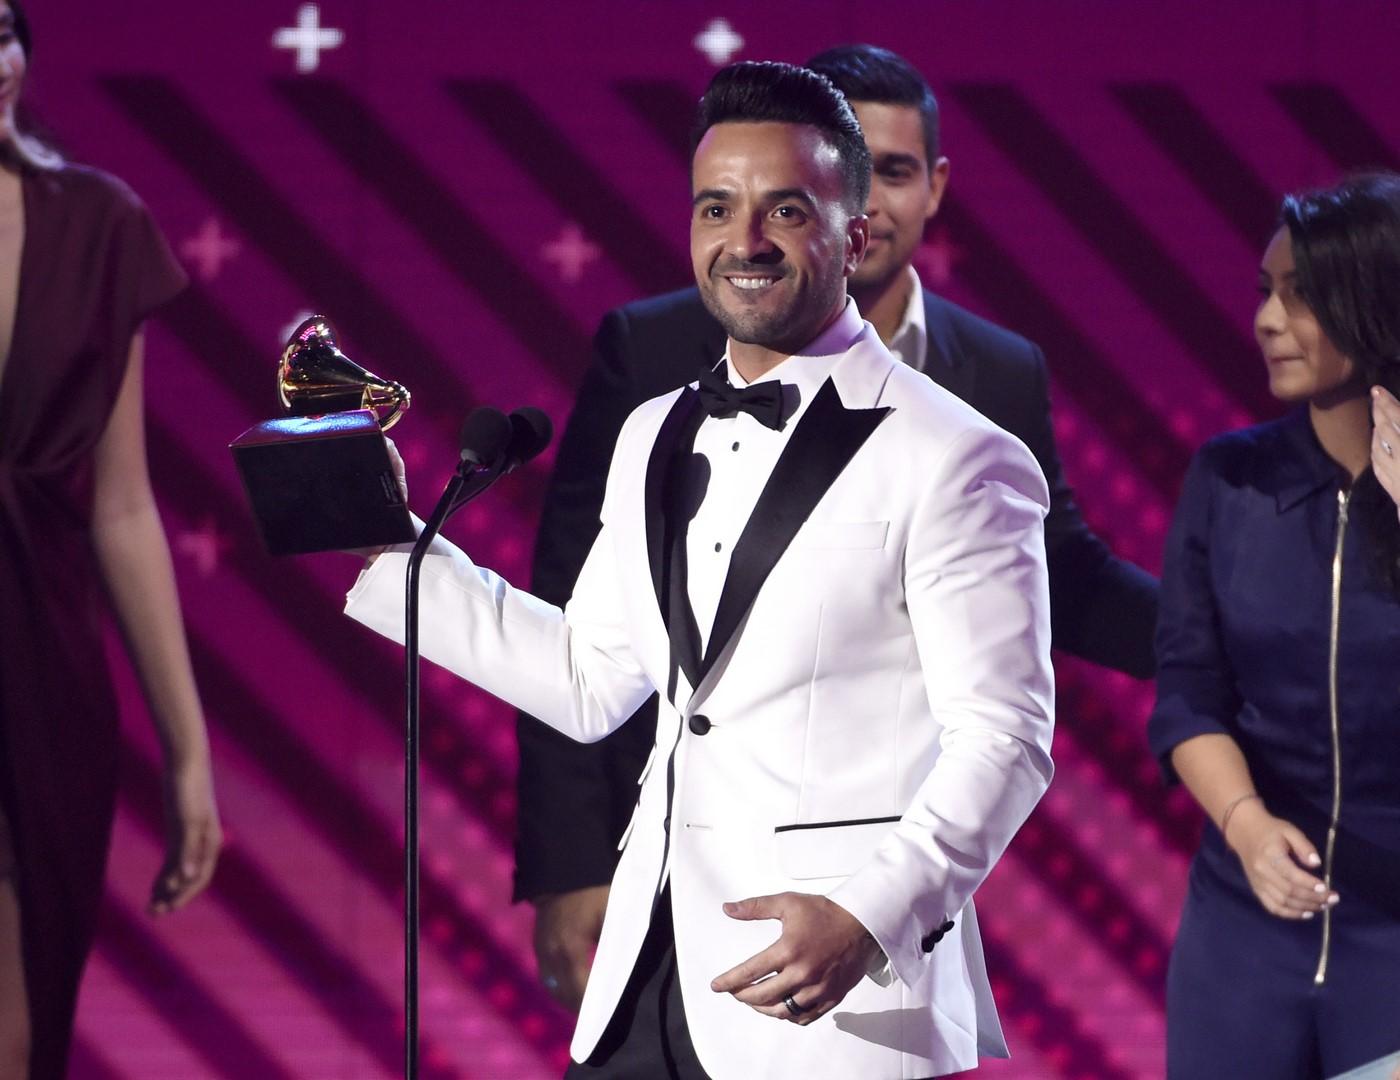 Luis Fonsi ganó el Premios Grammy Latinos